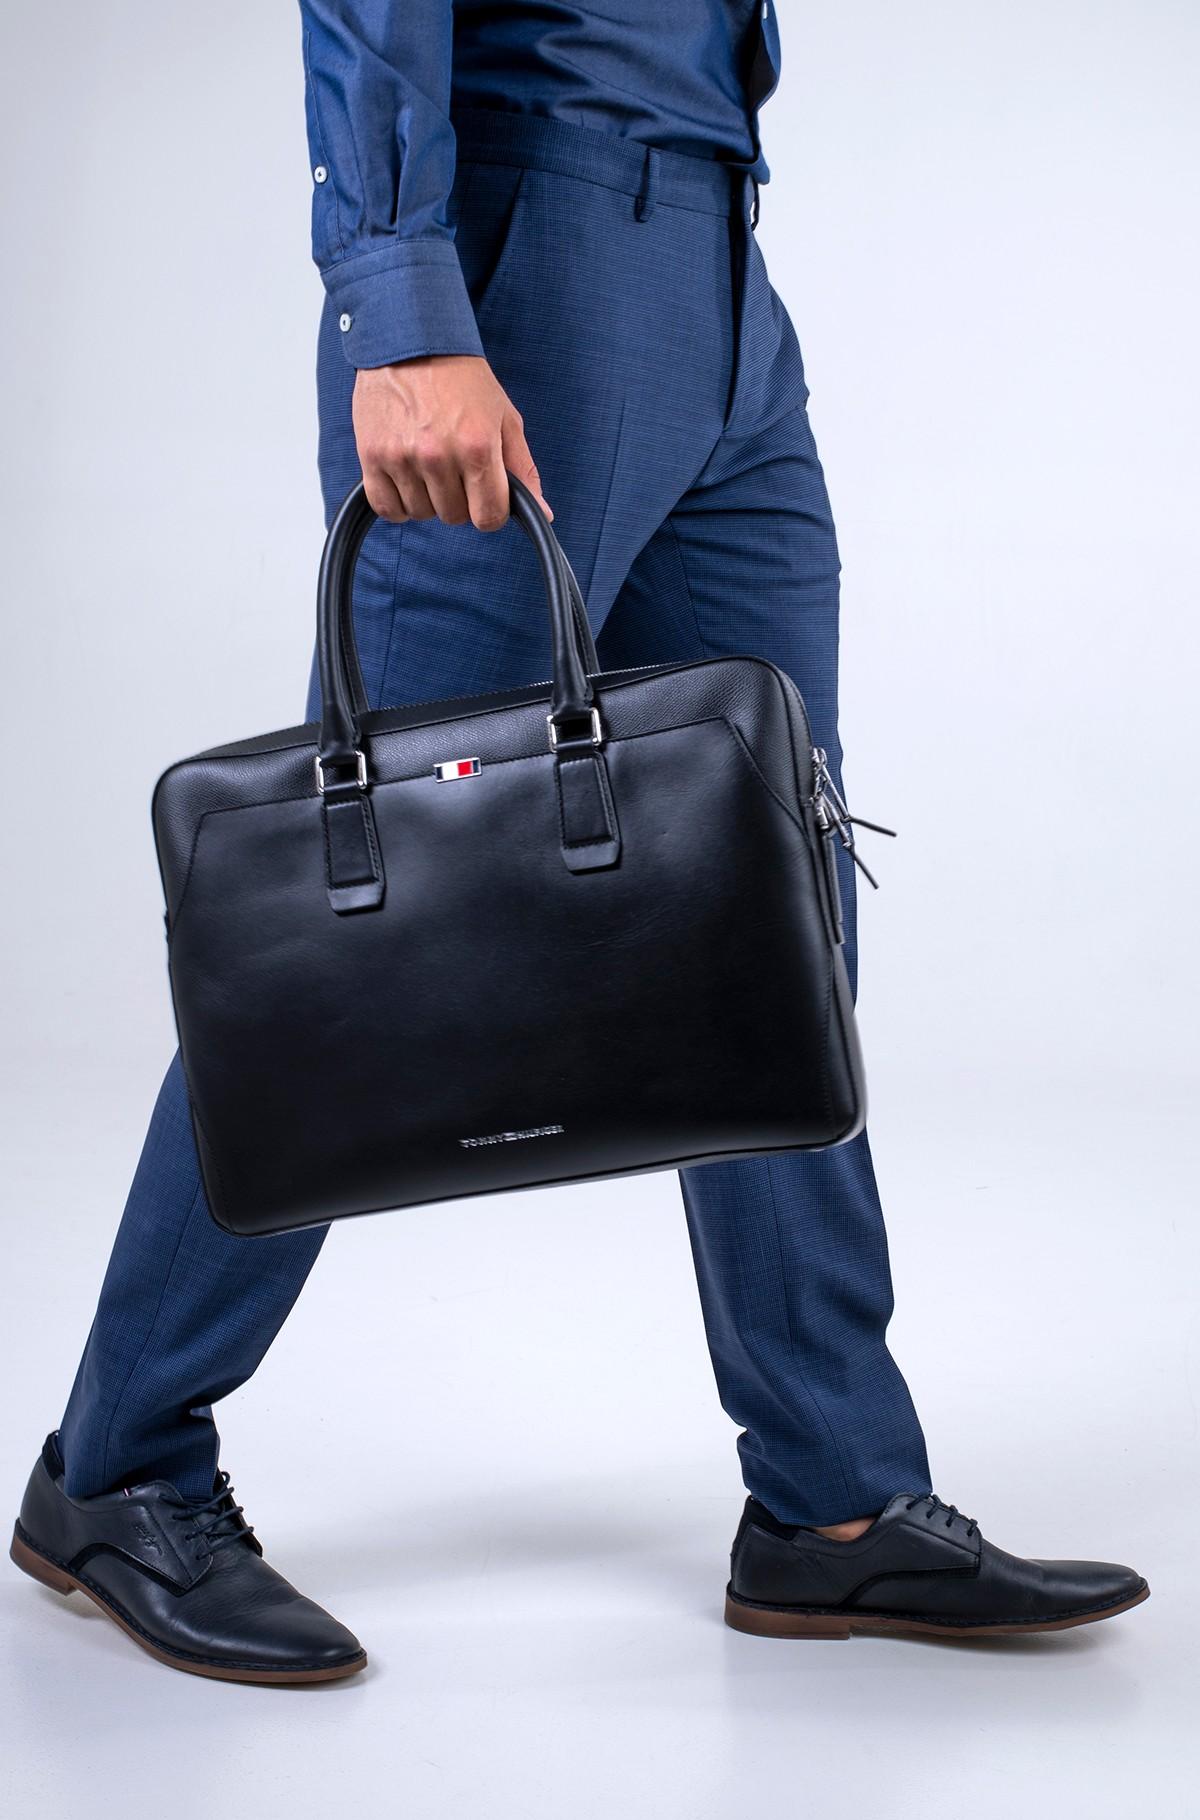 Arvutikott BUSINESS LEATHER SLIM COMP BAG-full-1